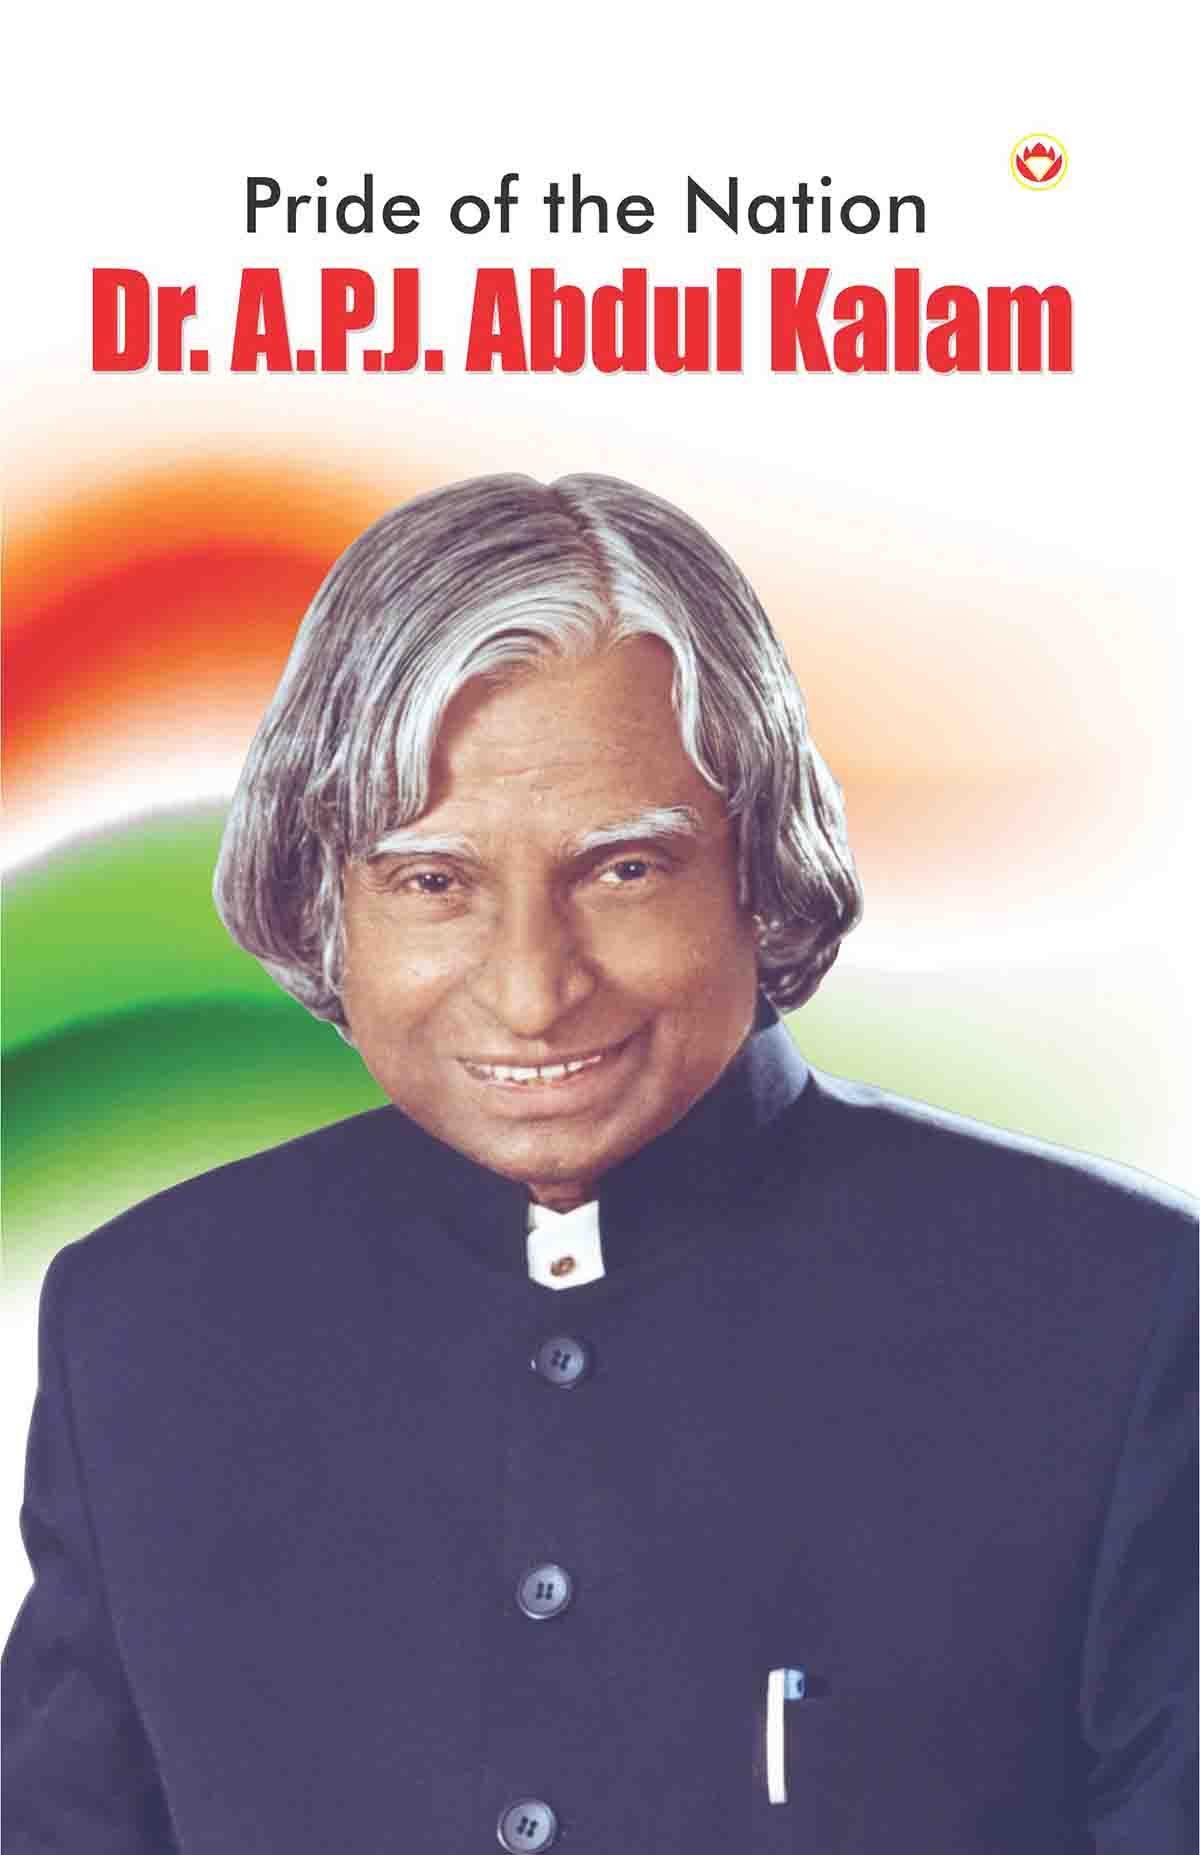 abdul kalam date of birth